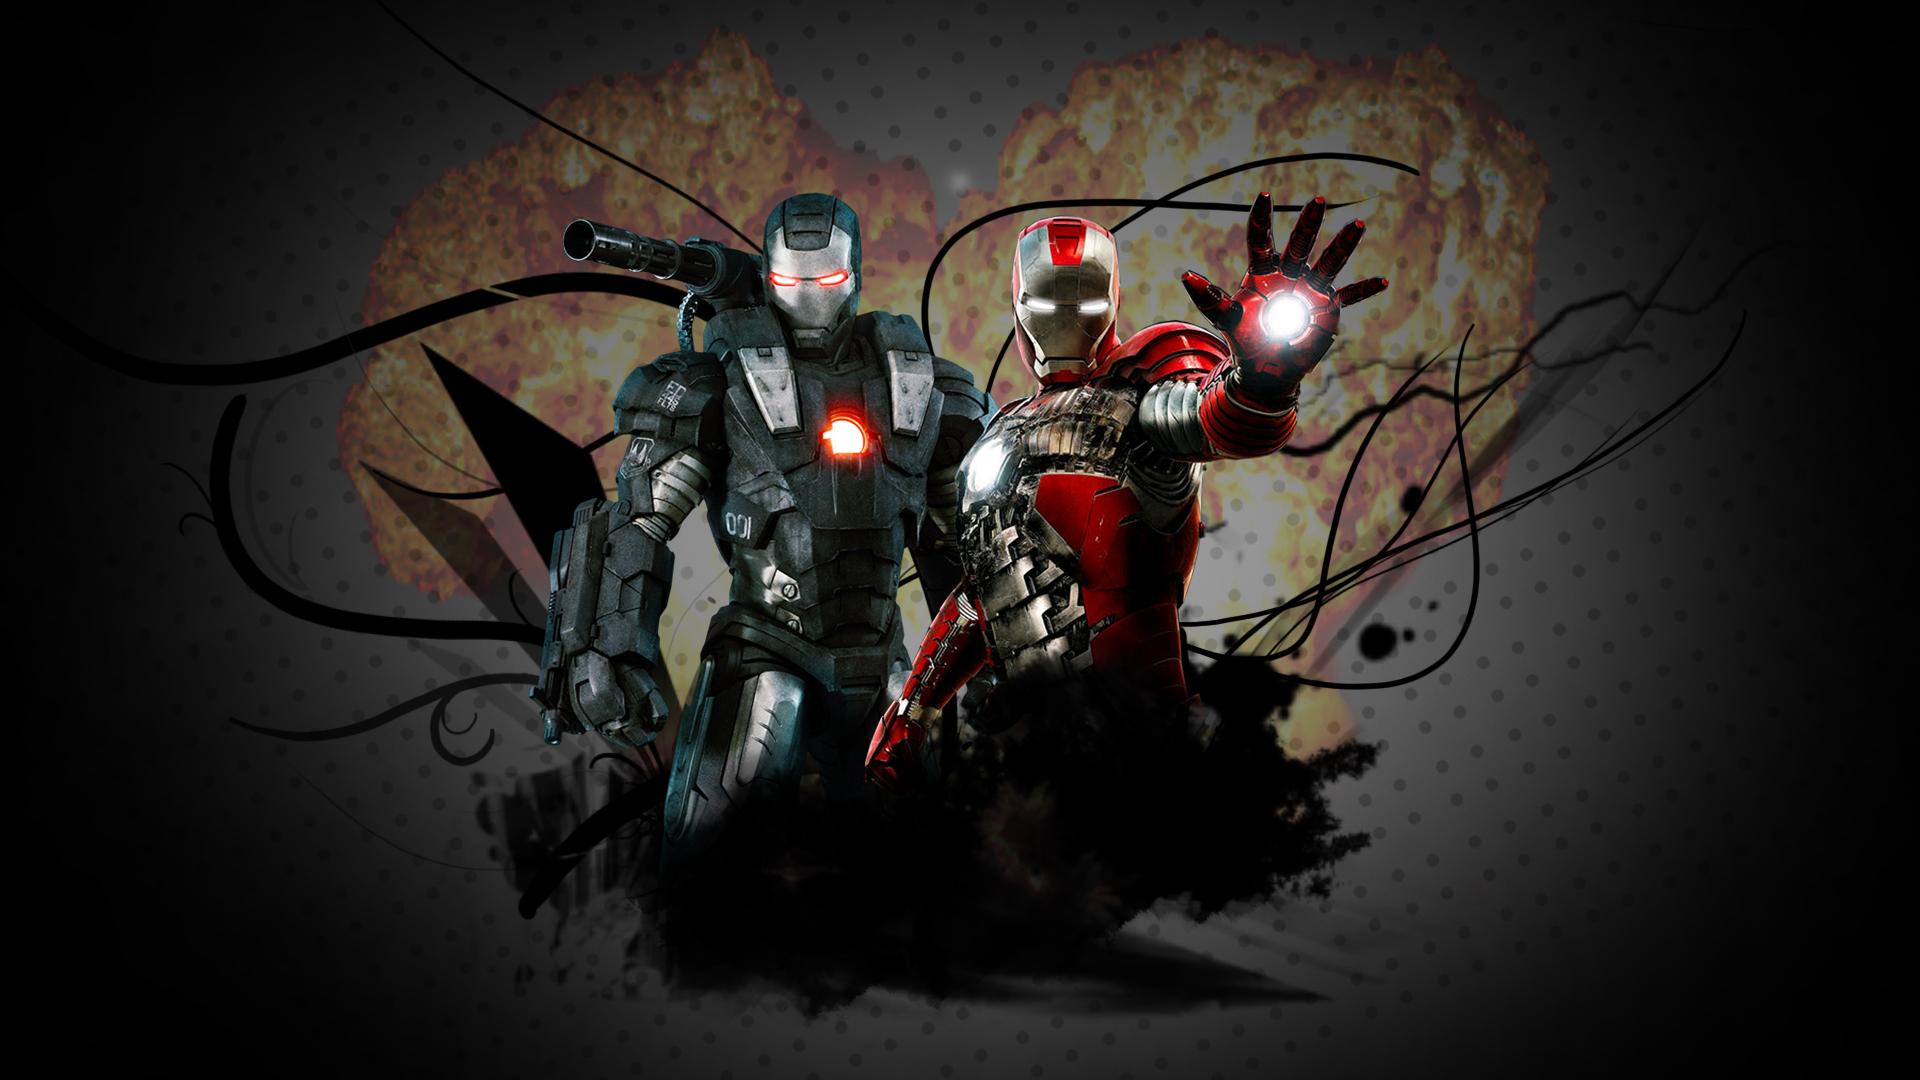 Download Iron Man HD Wallpaper 2344 Full Size downloadwallpaperhd 1920x1080